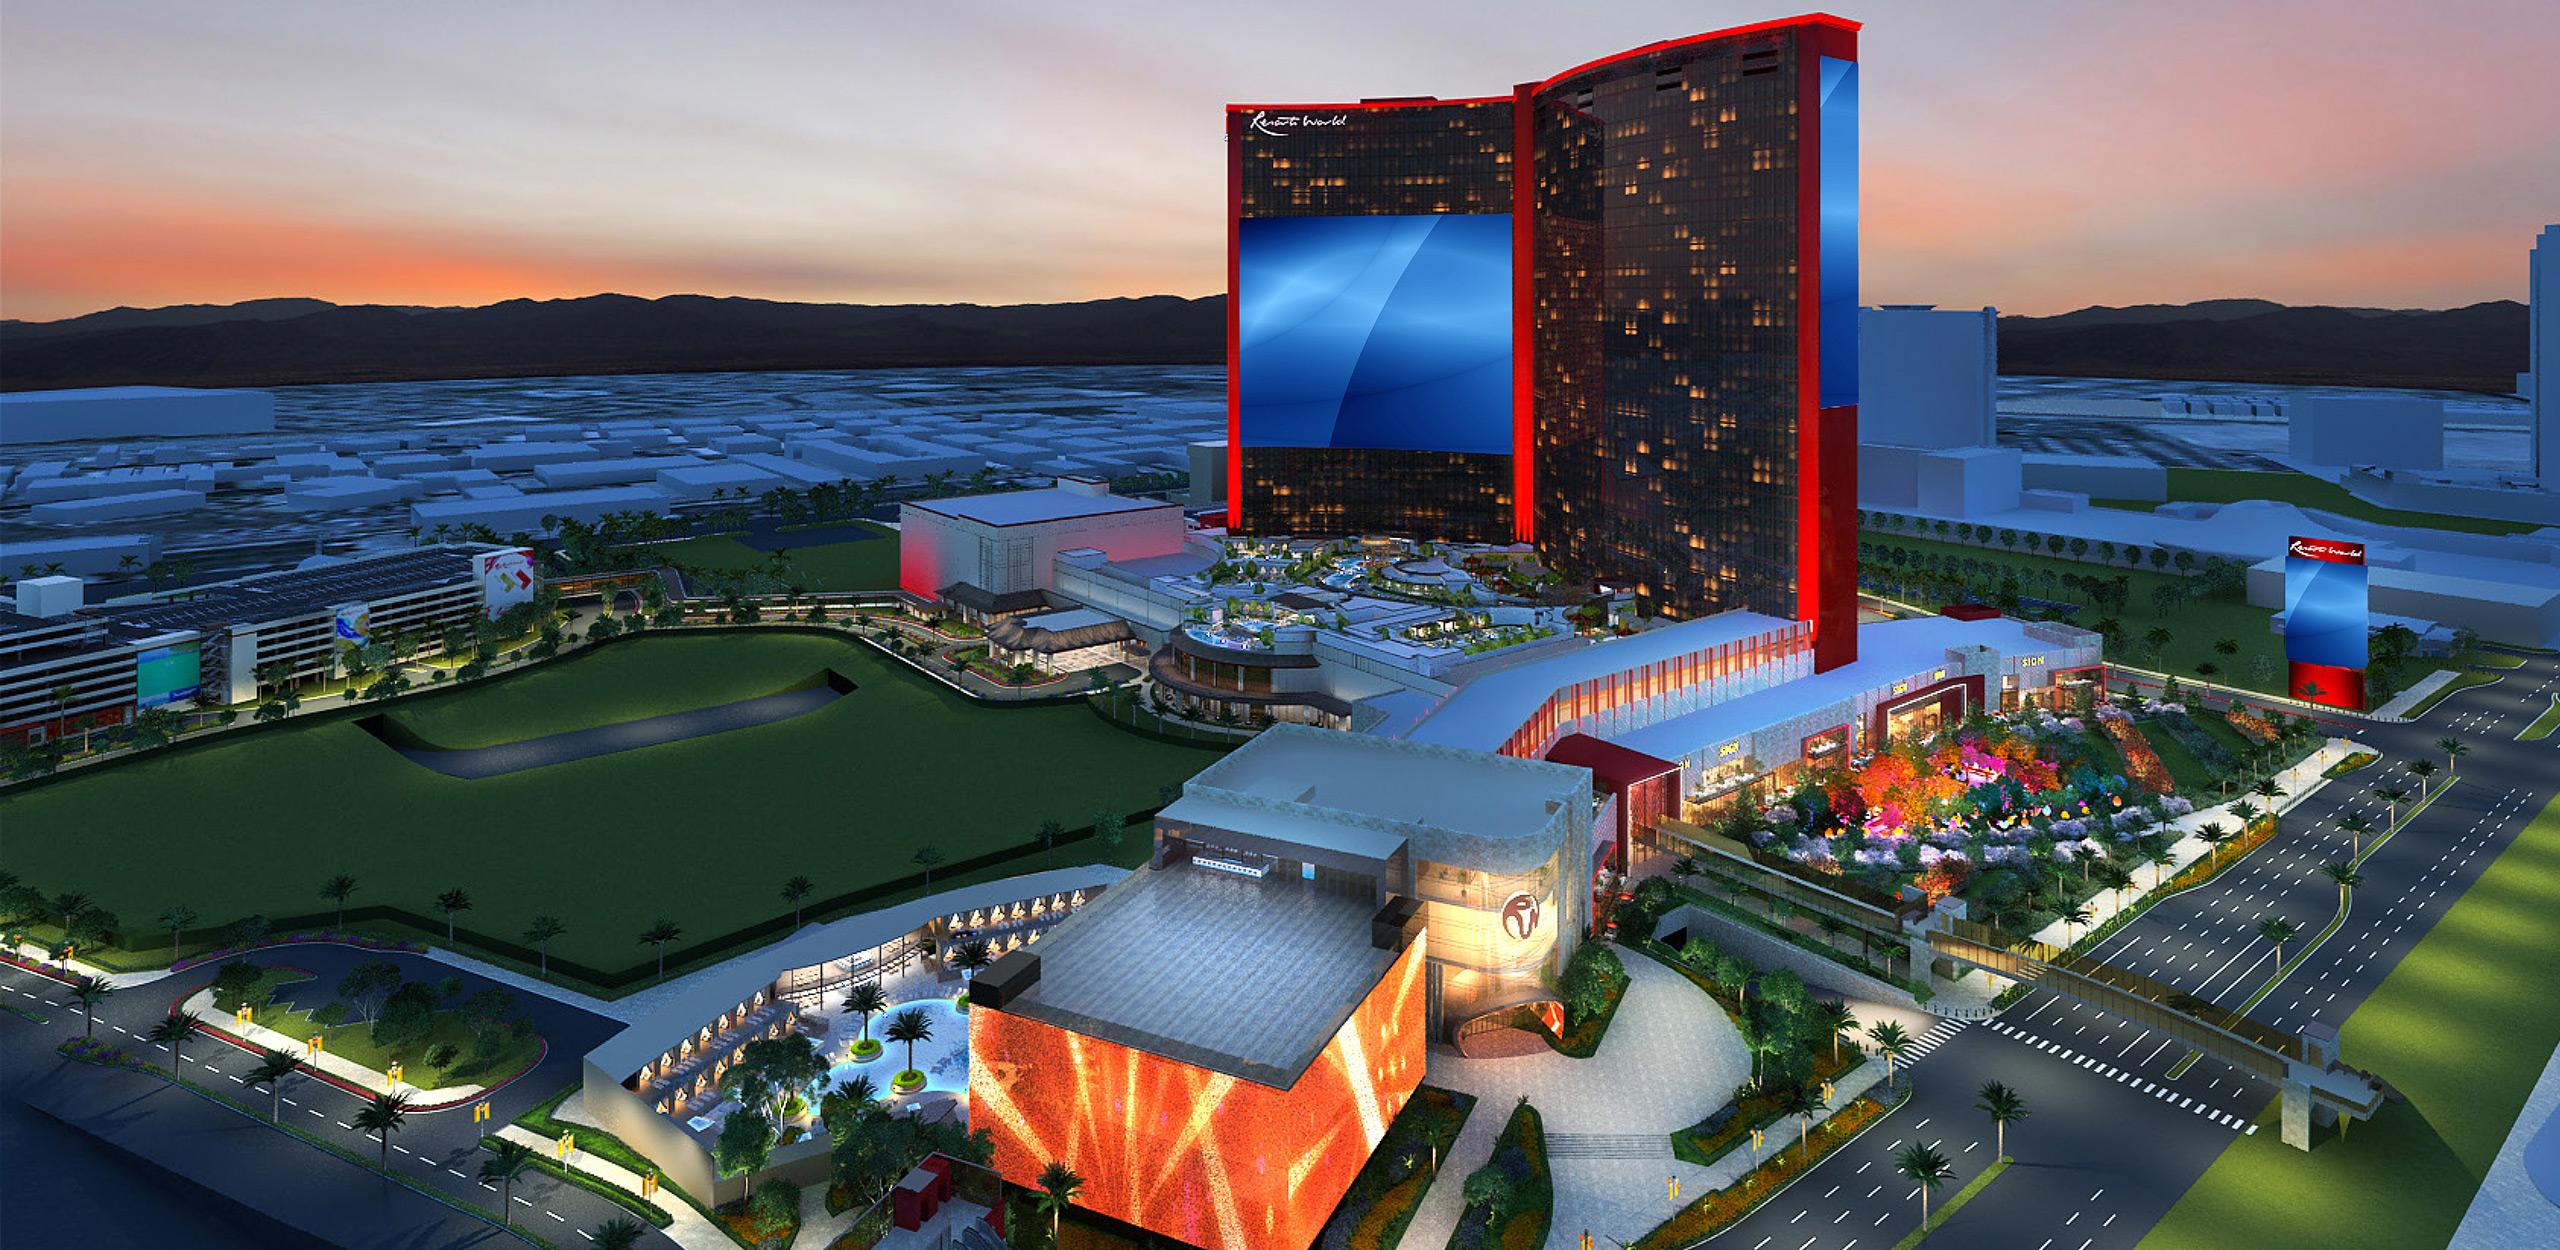 Resorts World Las Vegas plans extended